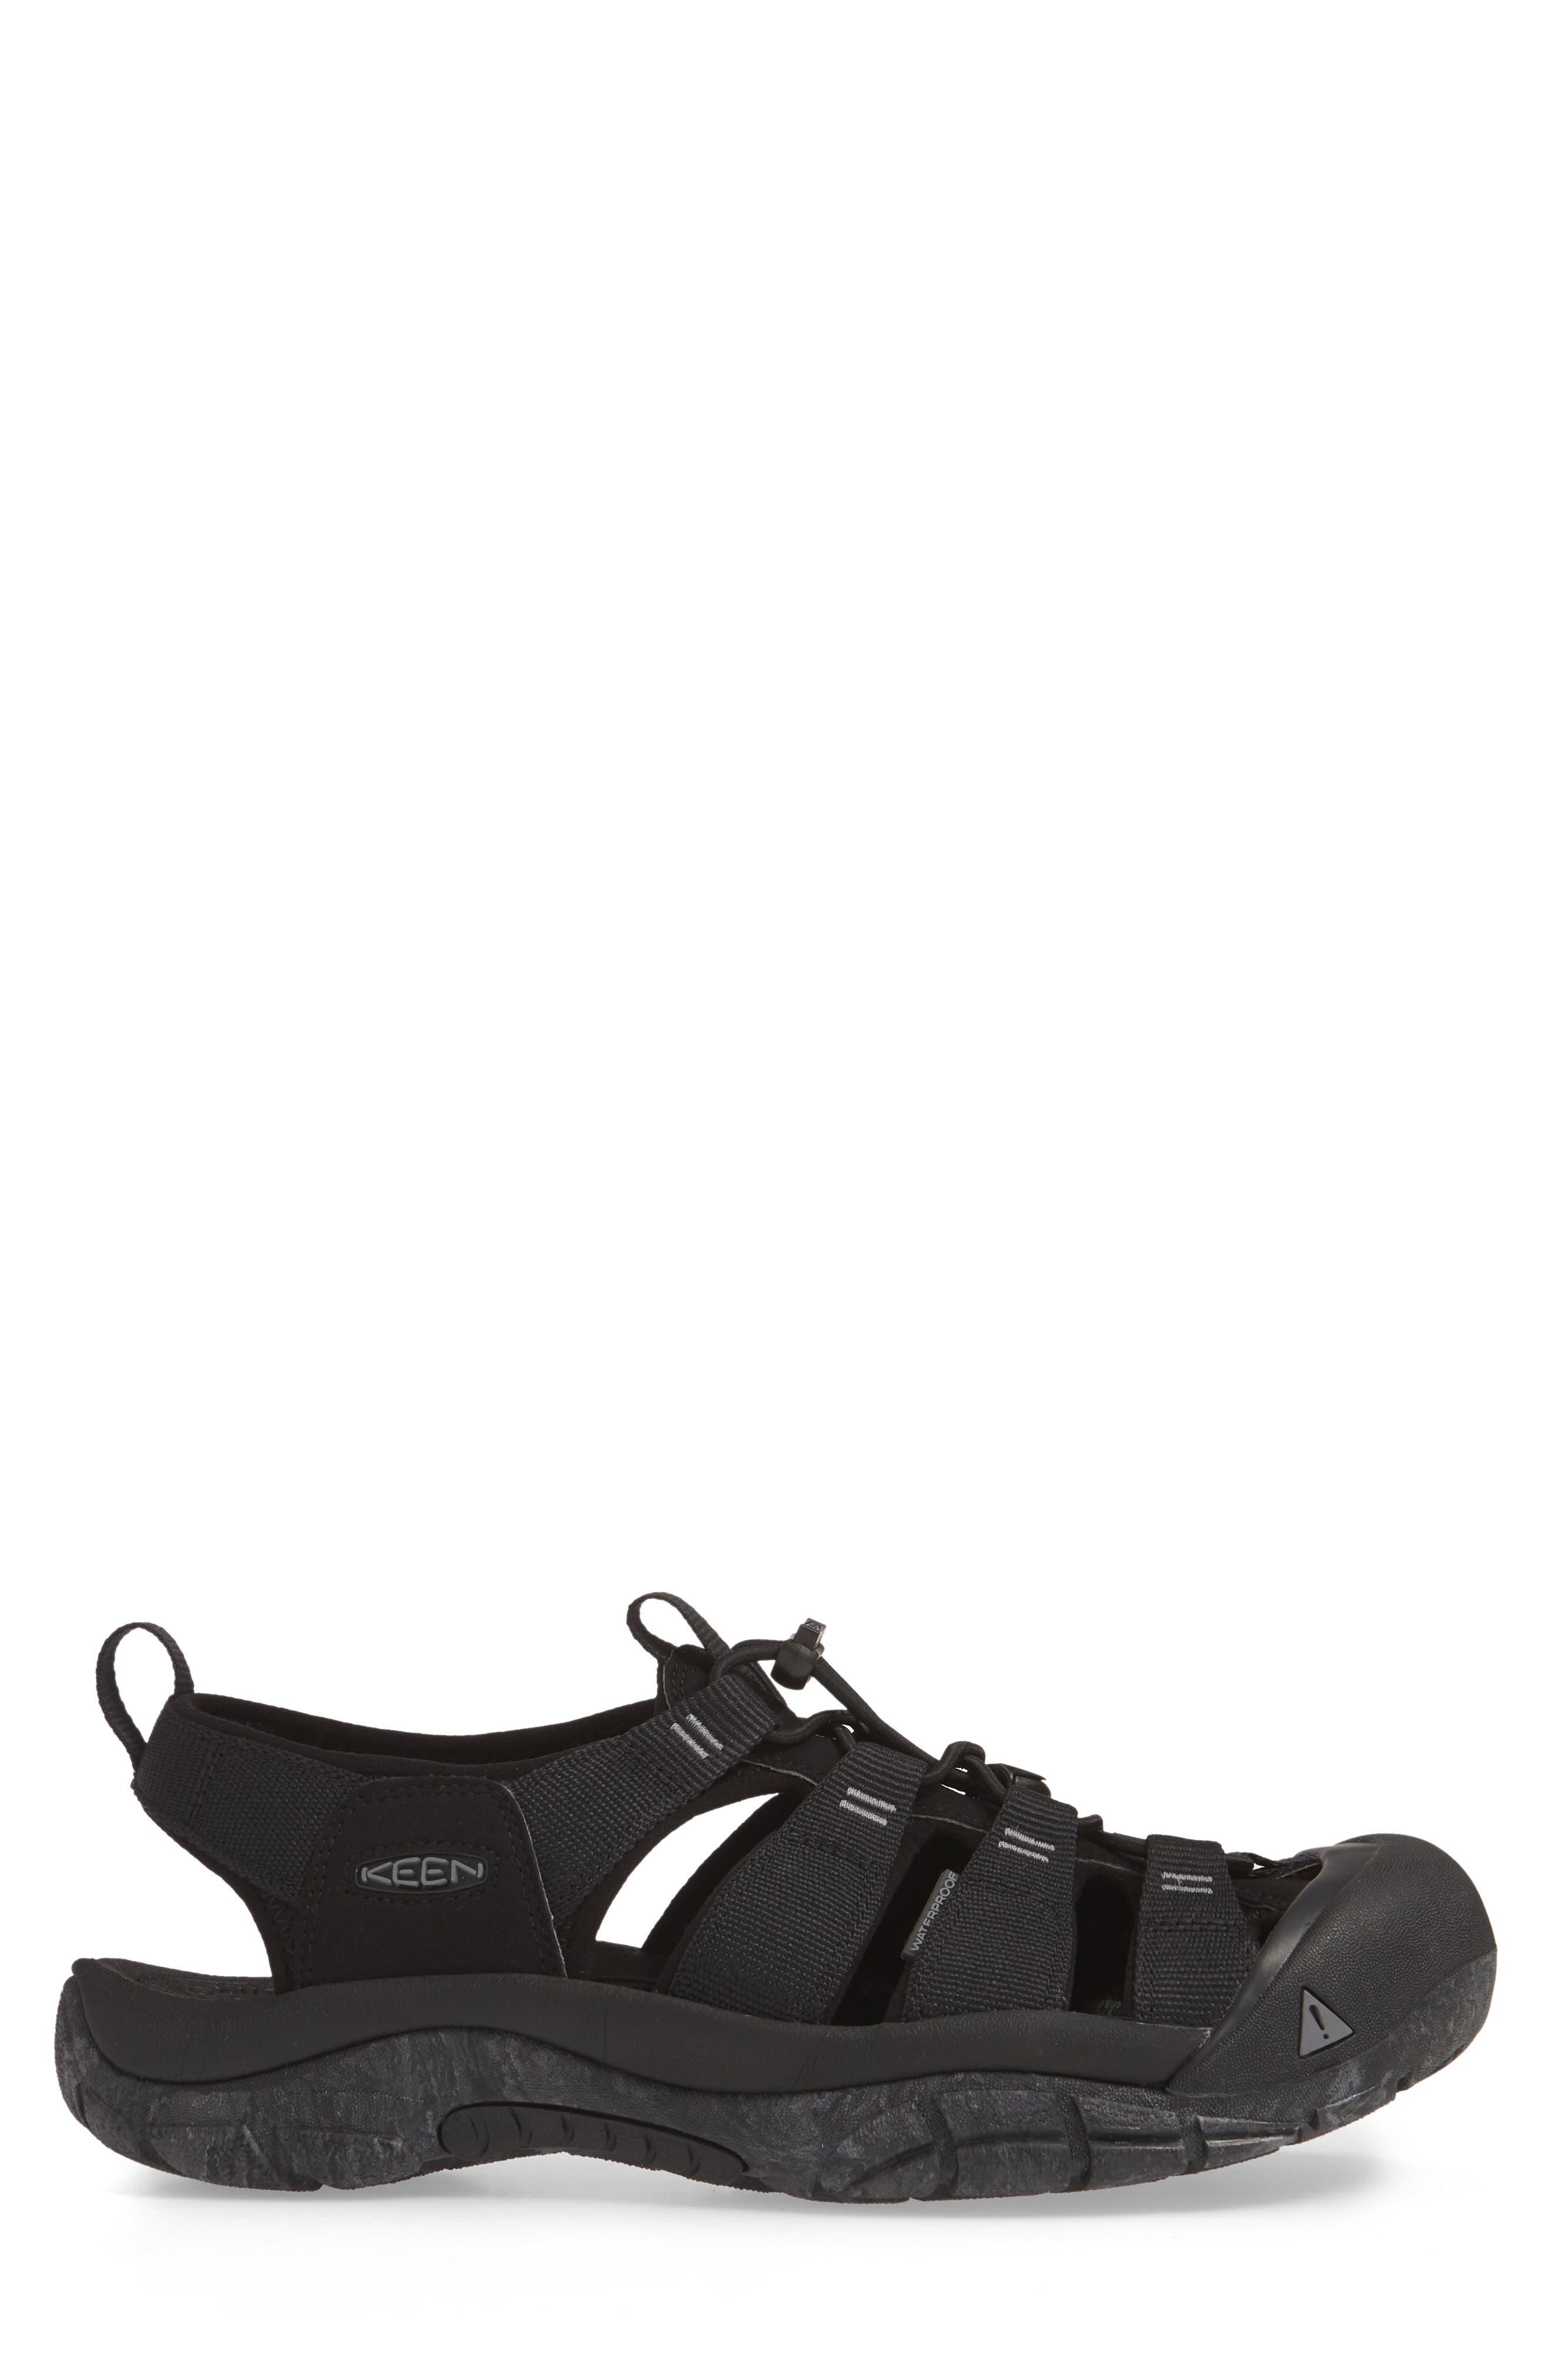 KEEN, 'Newport H2' Sandal, Alternate thumbnail 3, color, BLACK/ SWIRL OUTSOLE